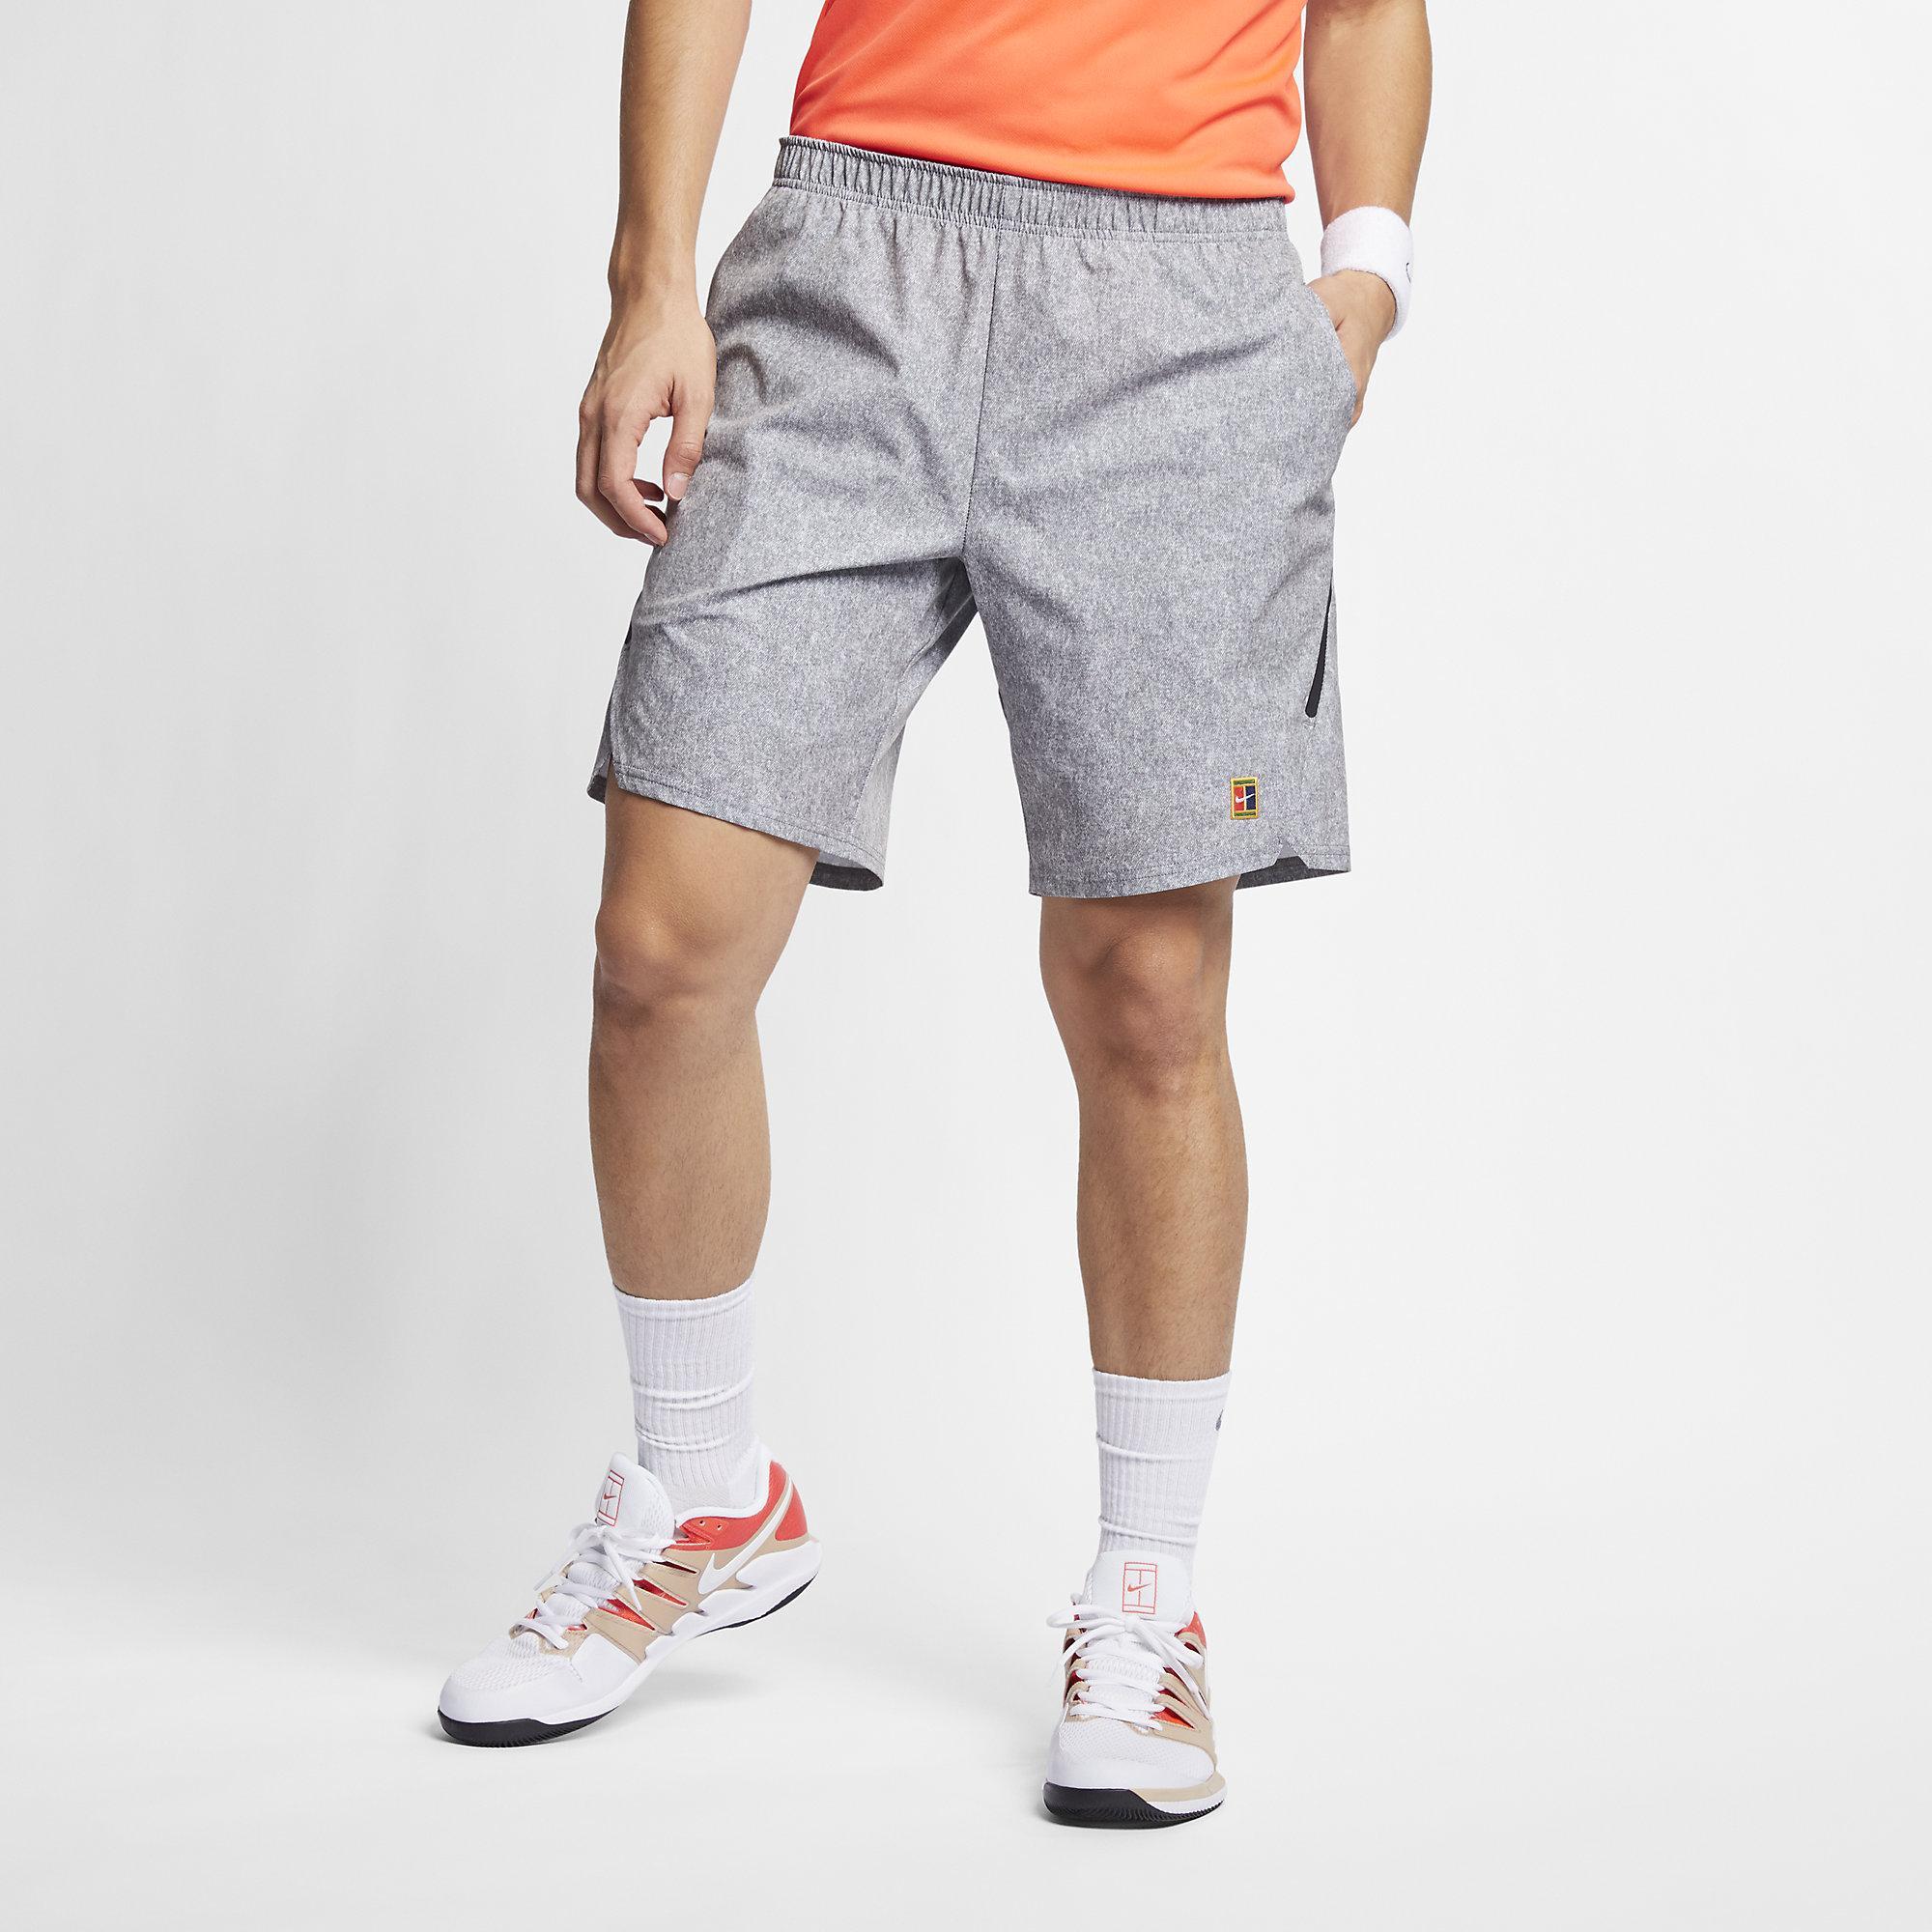 42ef9bece4c8 Nike Mens Flex Ace 9 Inch Shorts - Cool Grey White - Tennisnuts.com